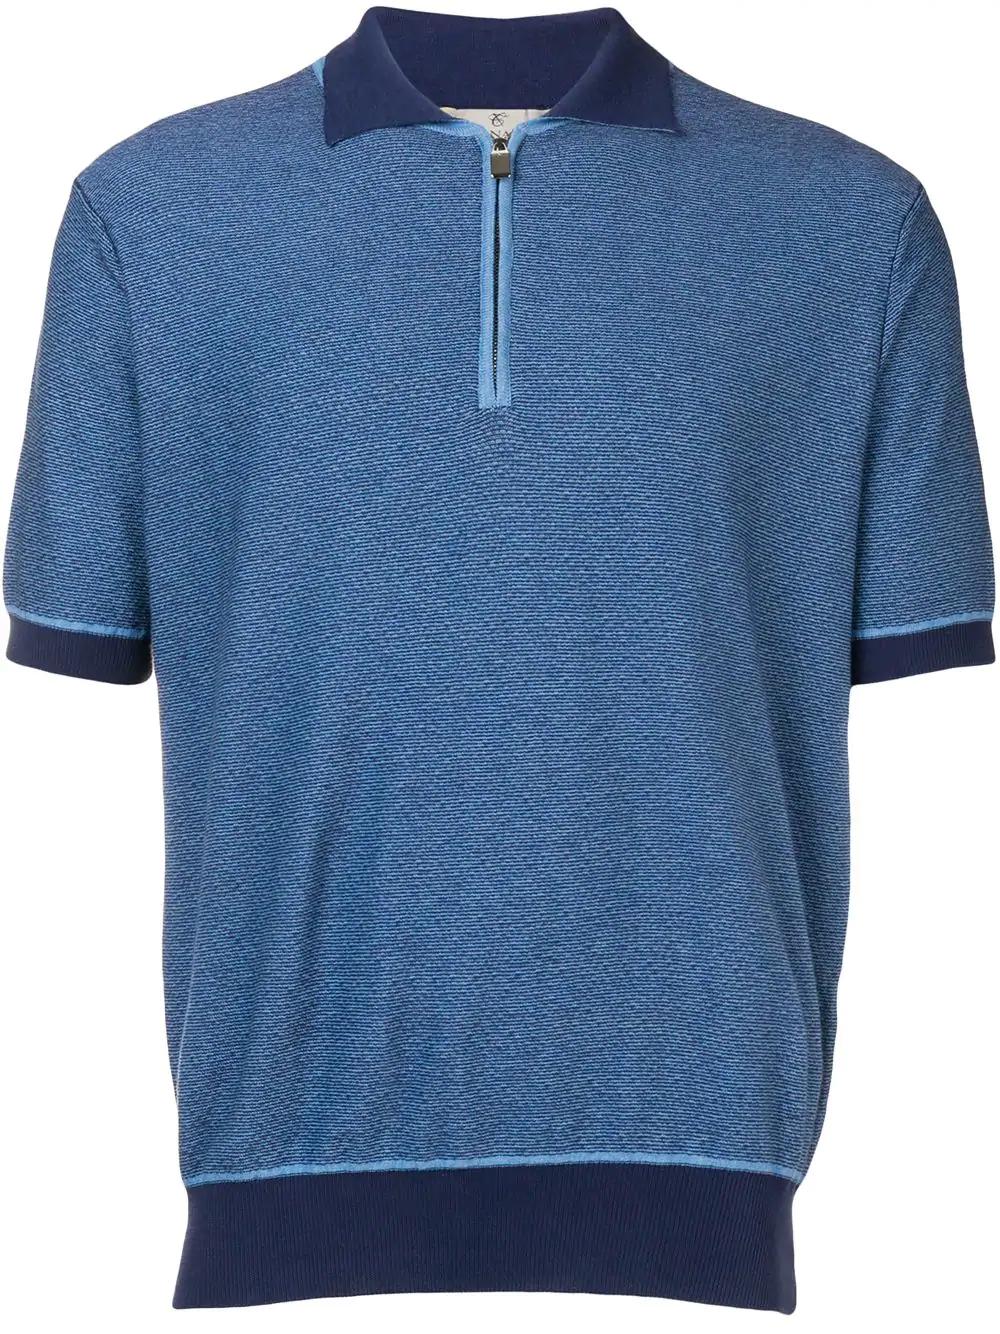 a695cbb6b Canali Contrast Trim Polo Shirt - Blue